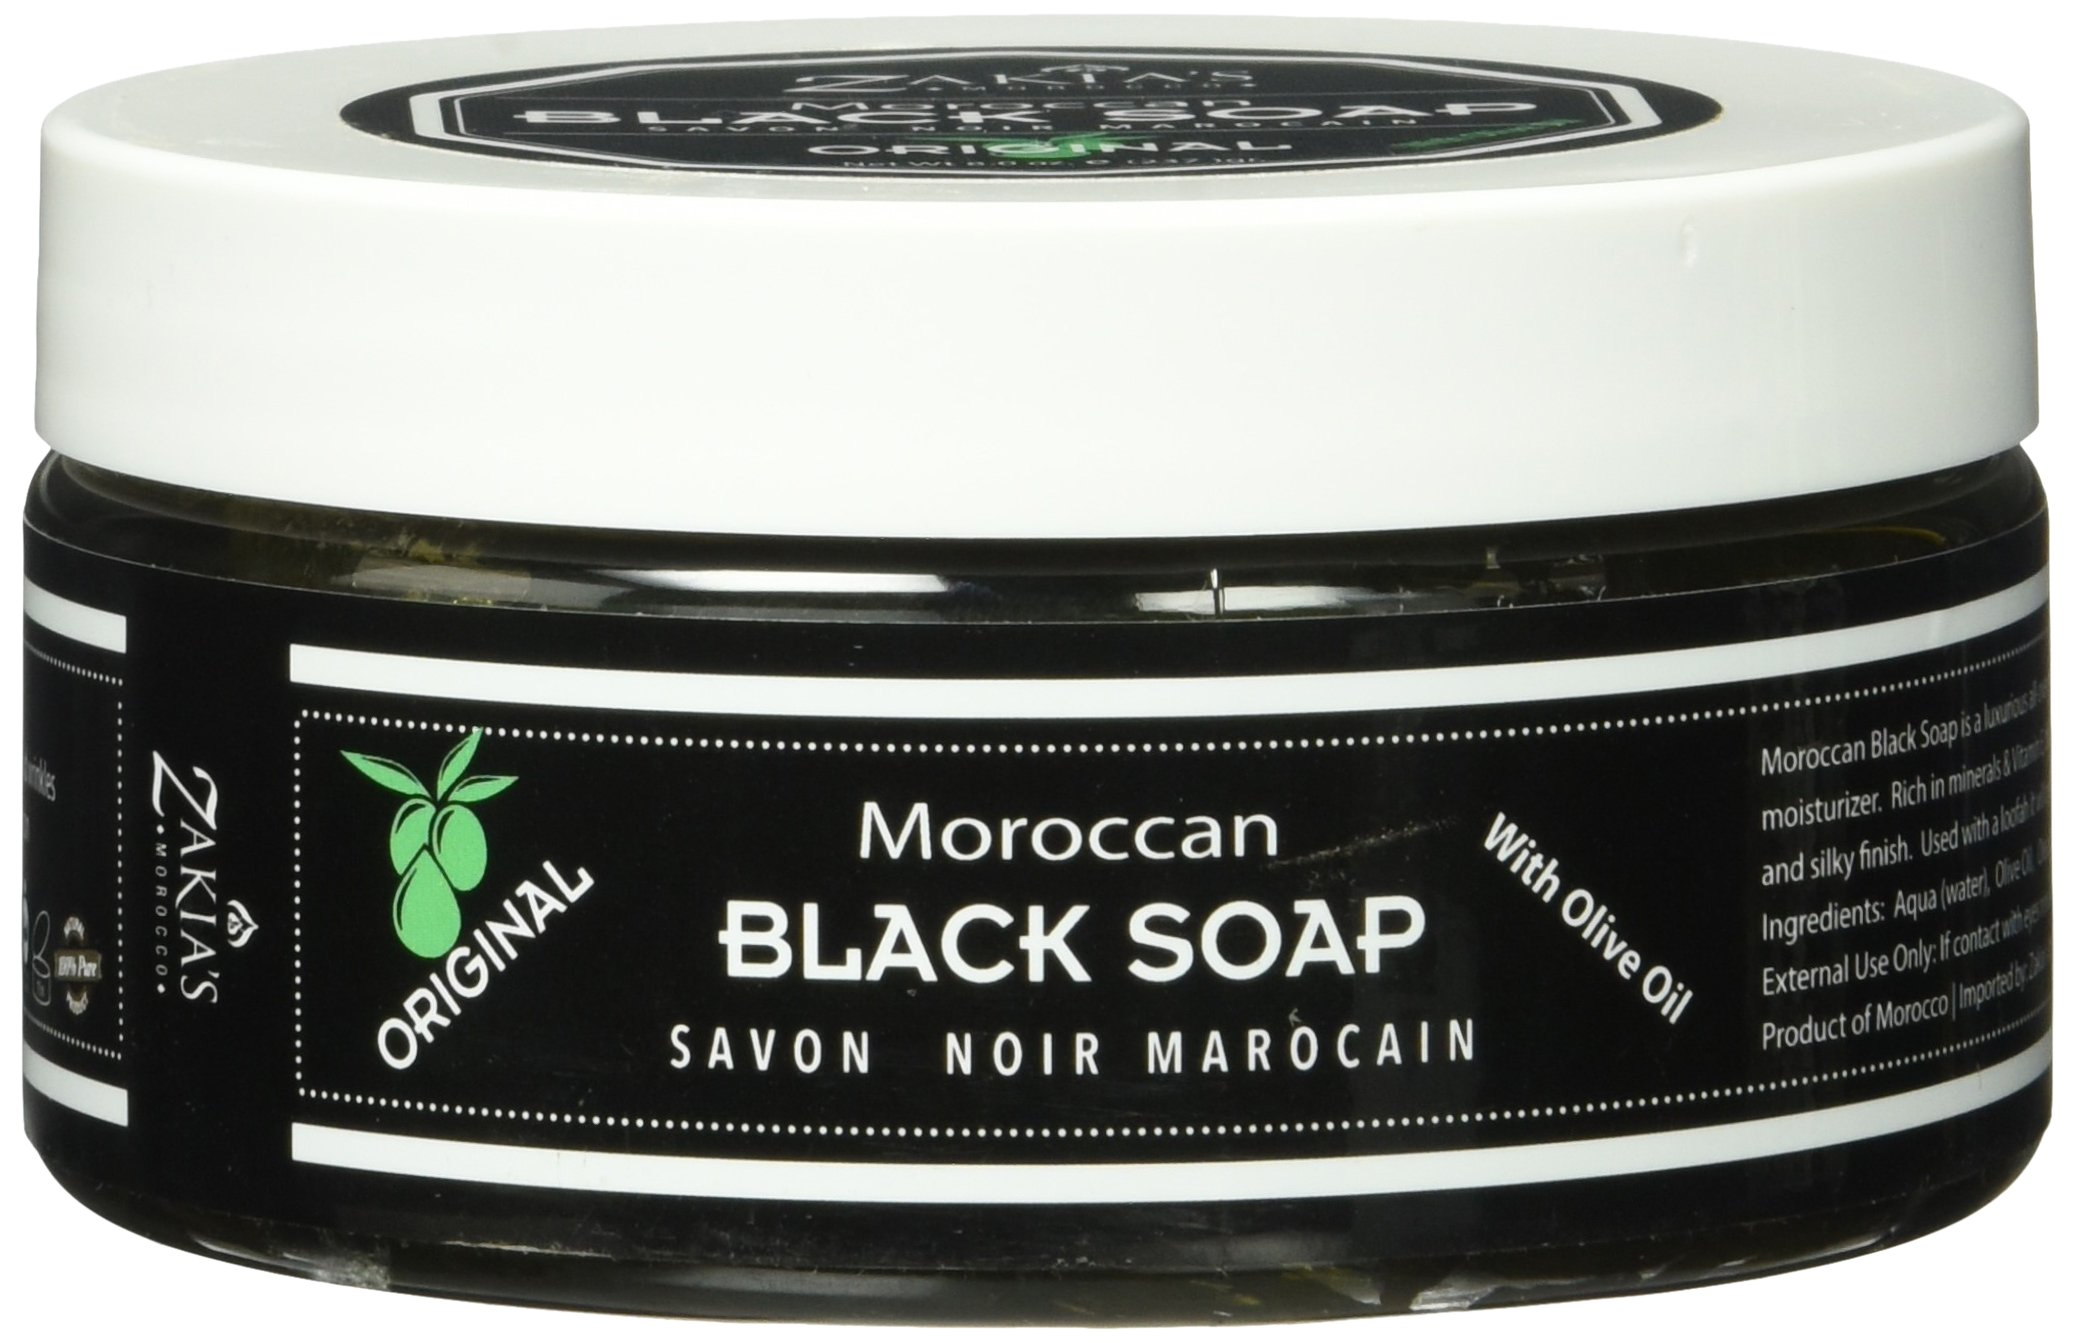 Moroccan Black Soap - Original-The Healing Soap … …